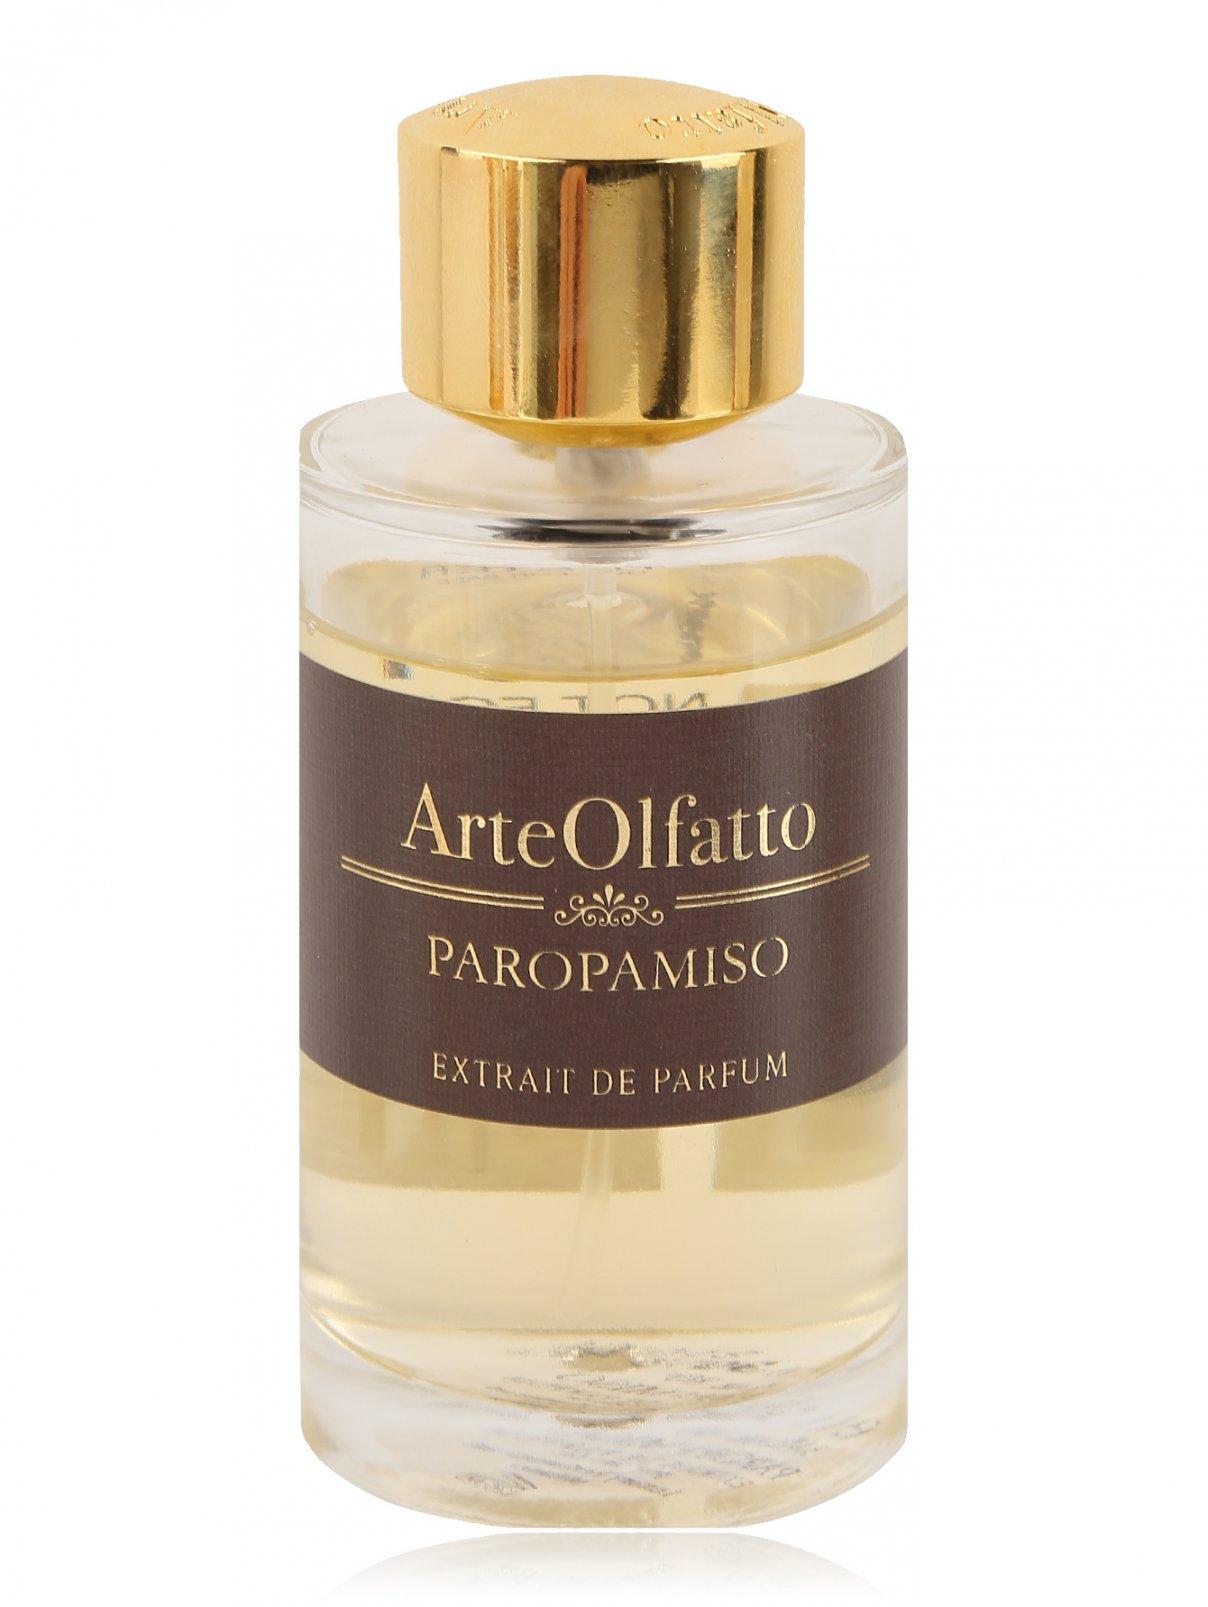 Духи 100 мл Paropamiso Paropamiso ArteOlfatto  –  Общий вид